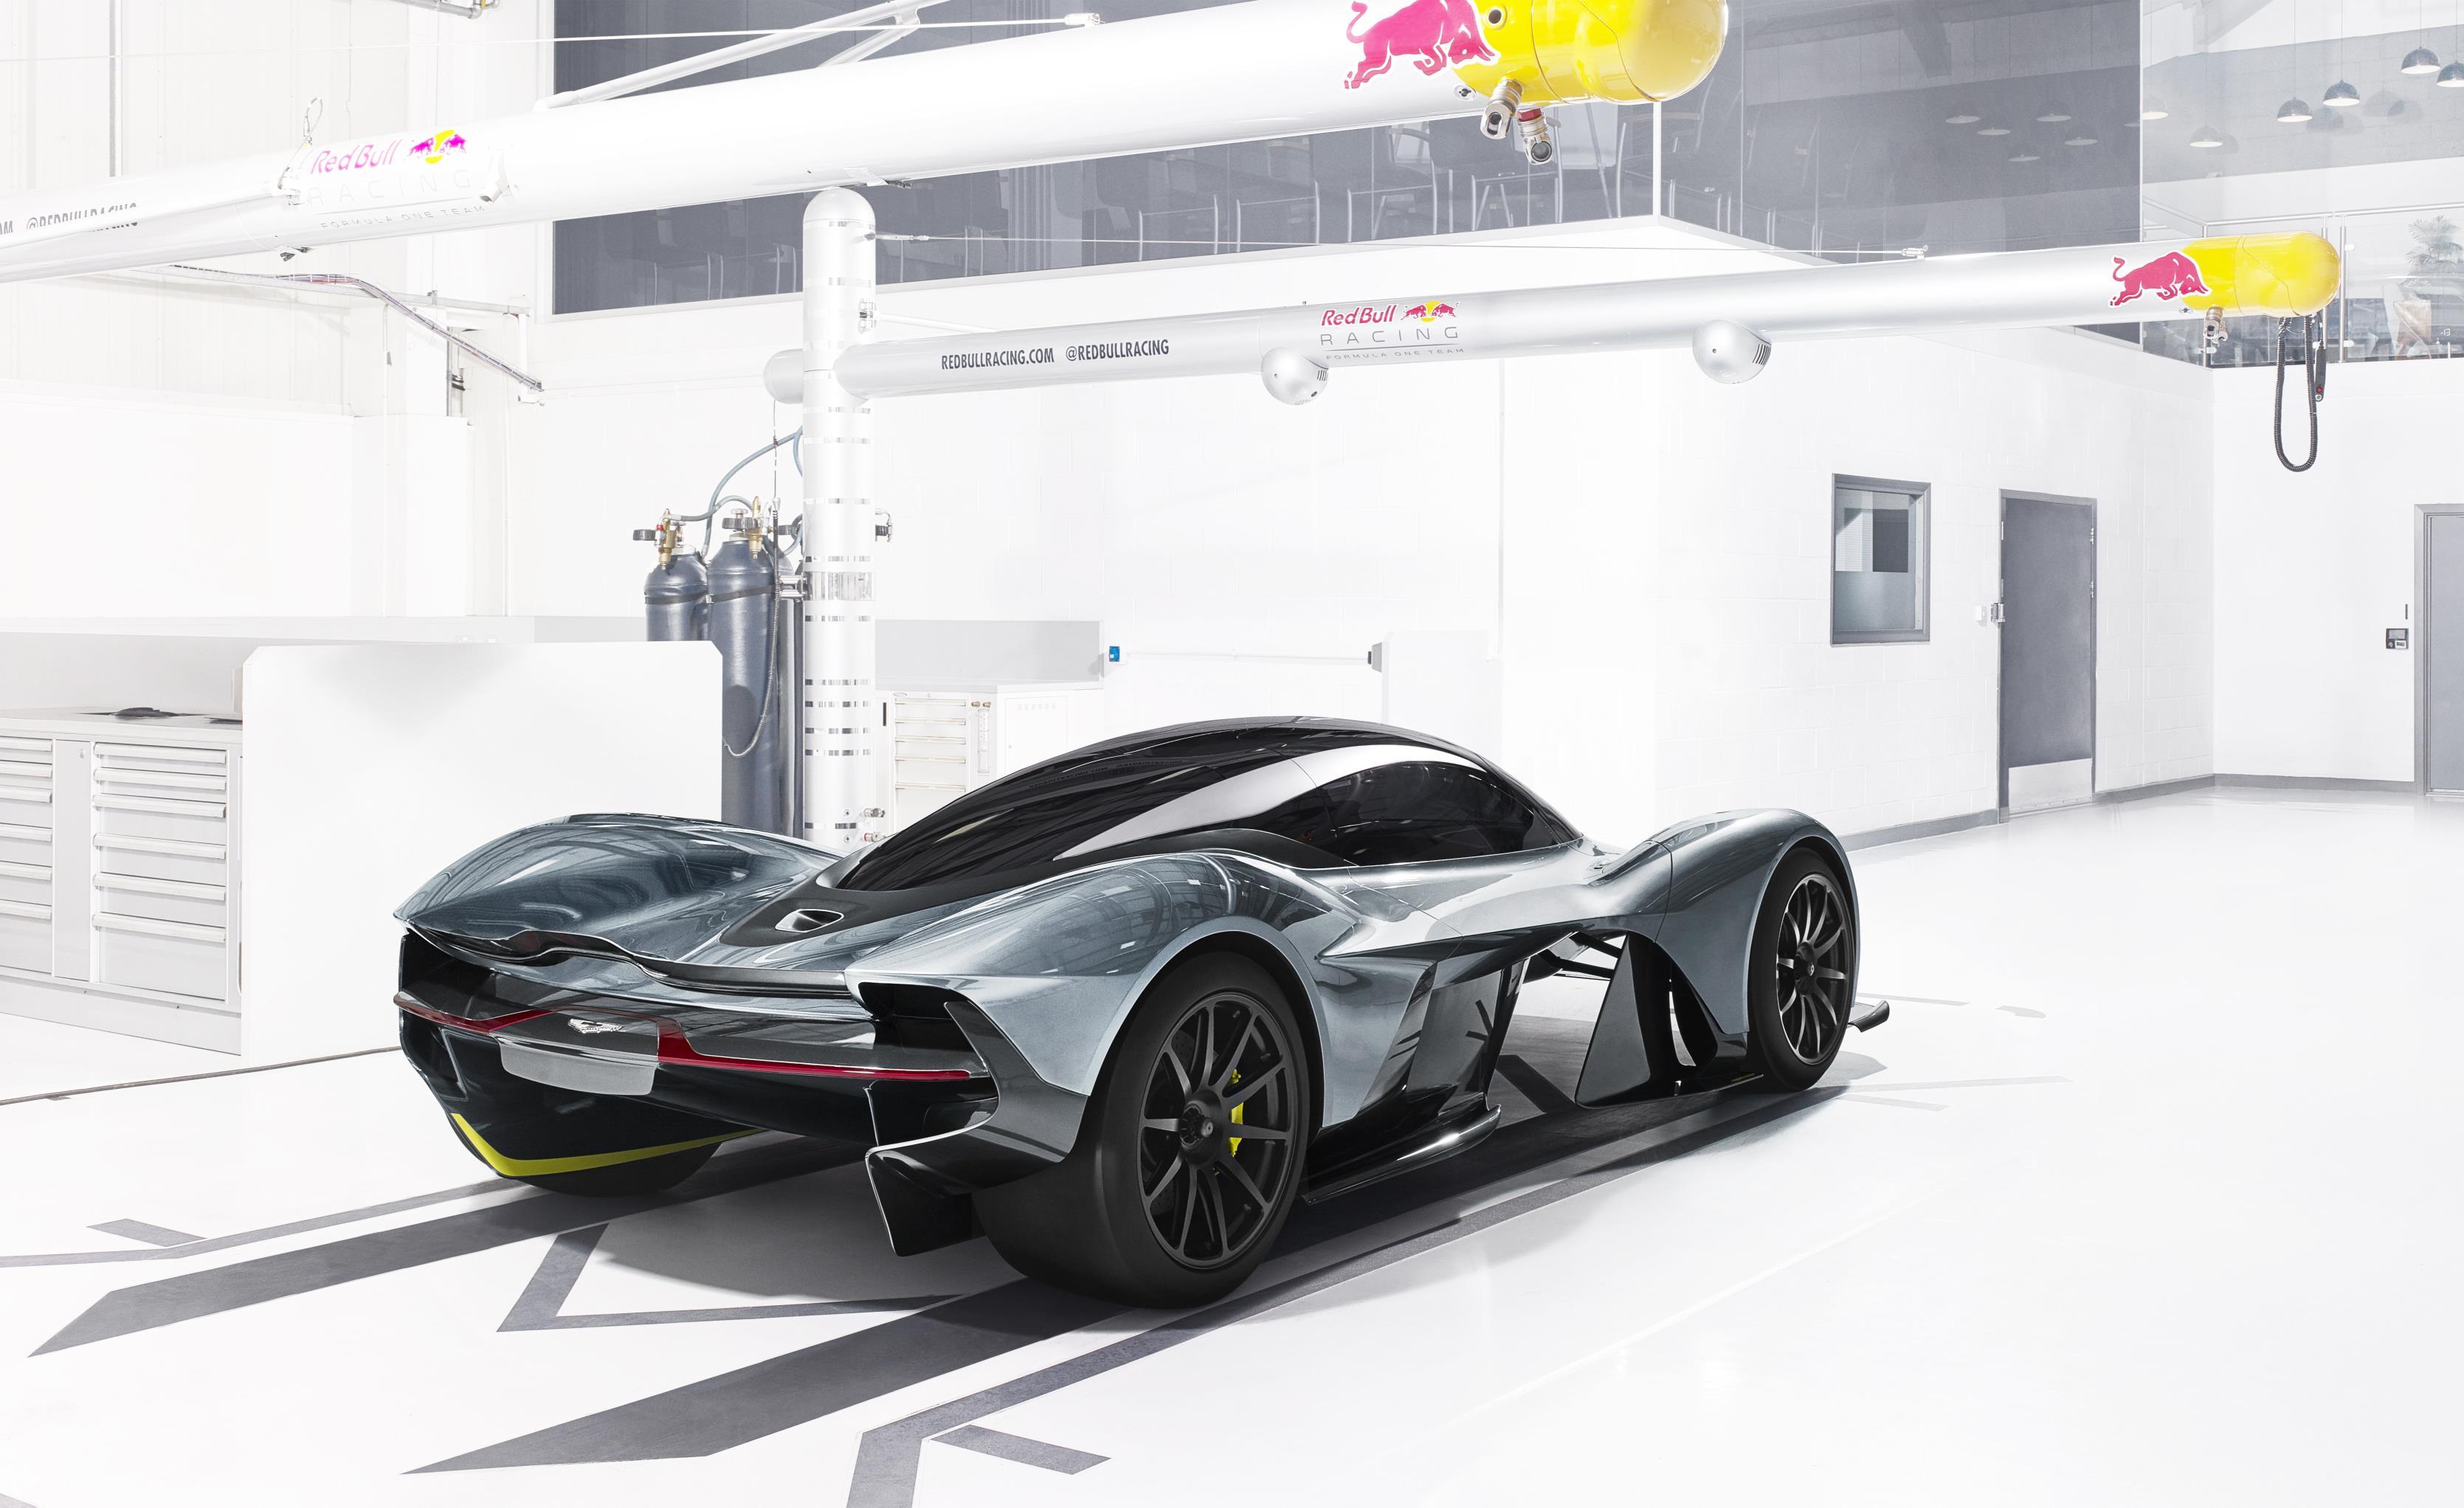 Aston Martin AMRB Hypercar To Cost Million A Pop - Aston martin cost